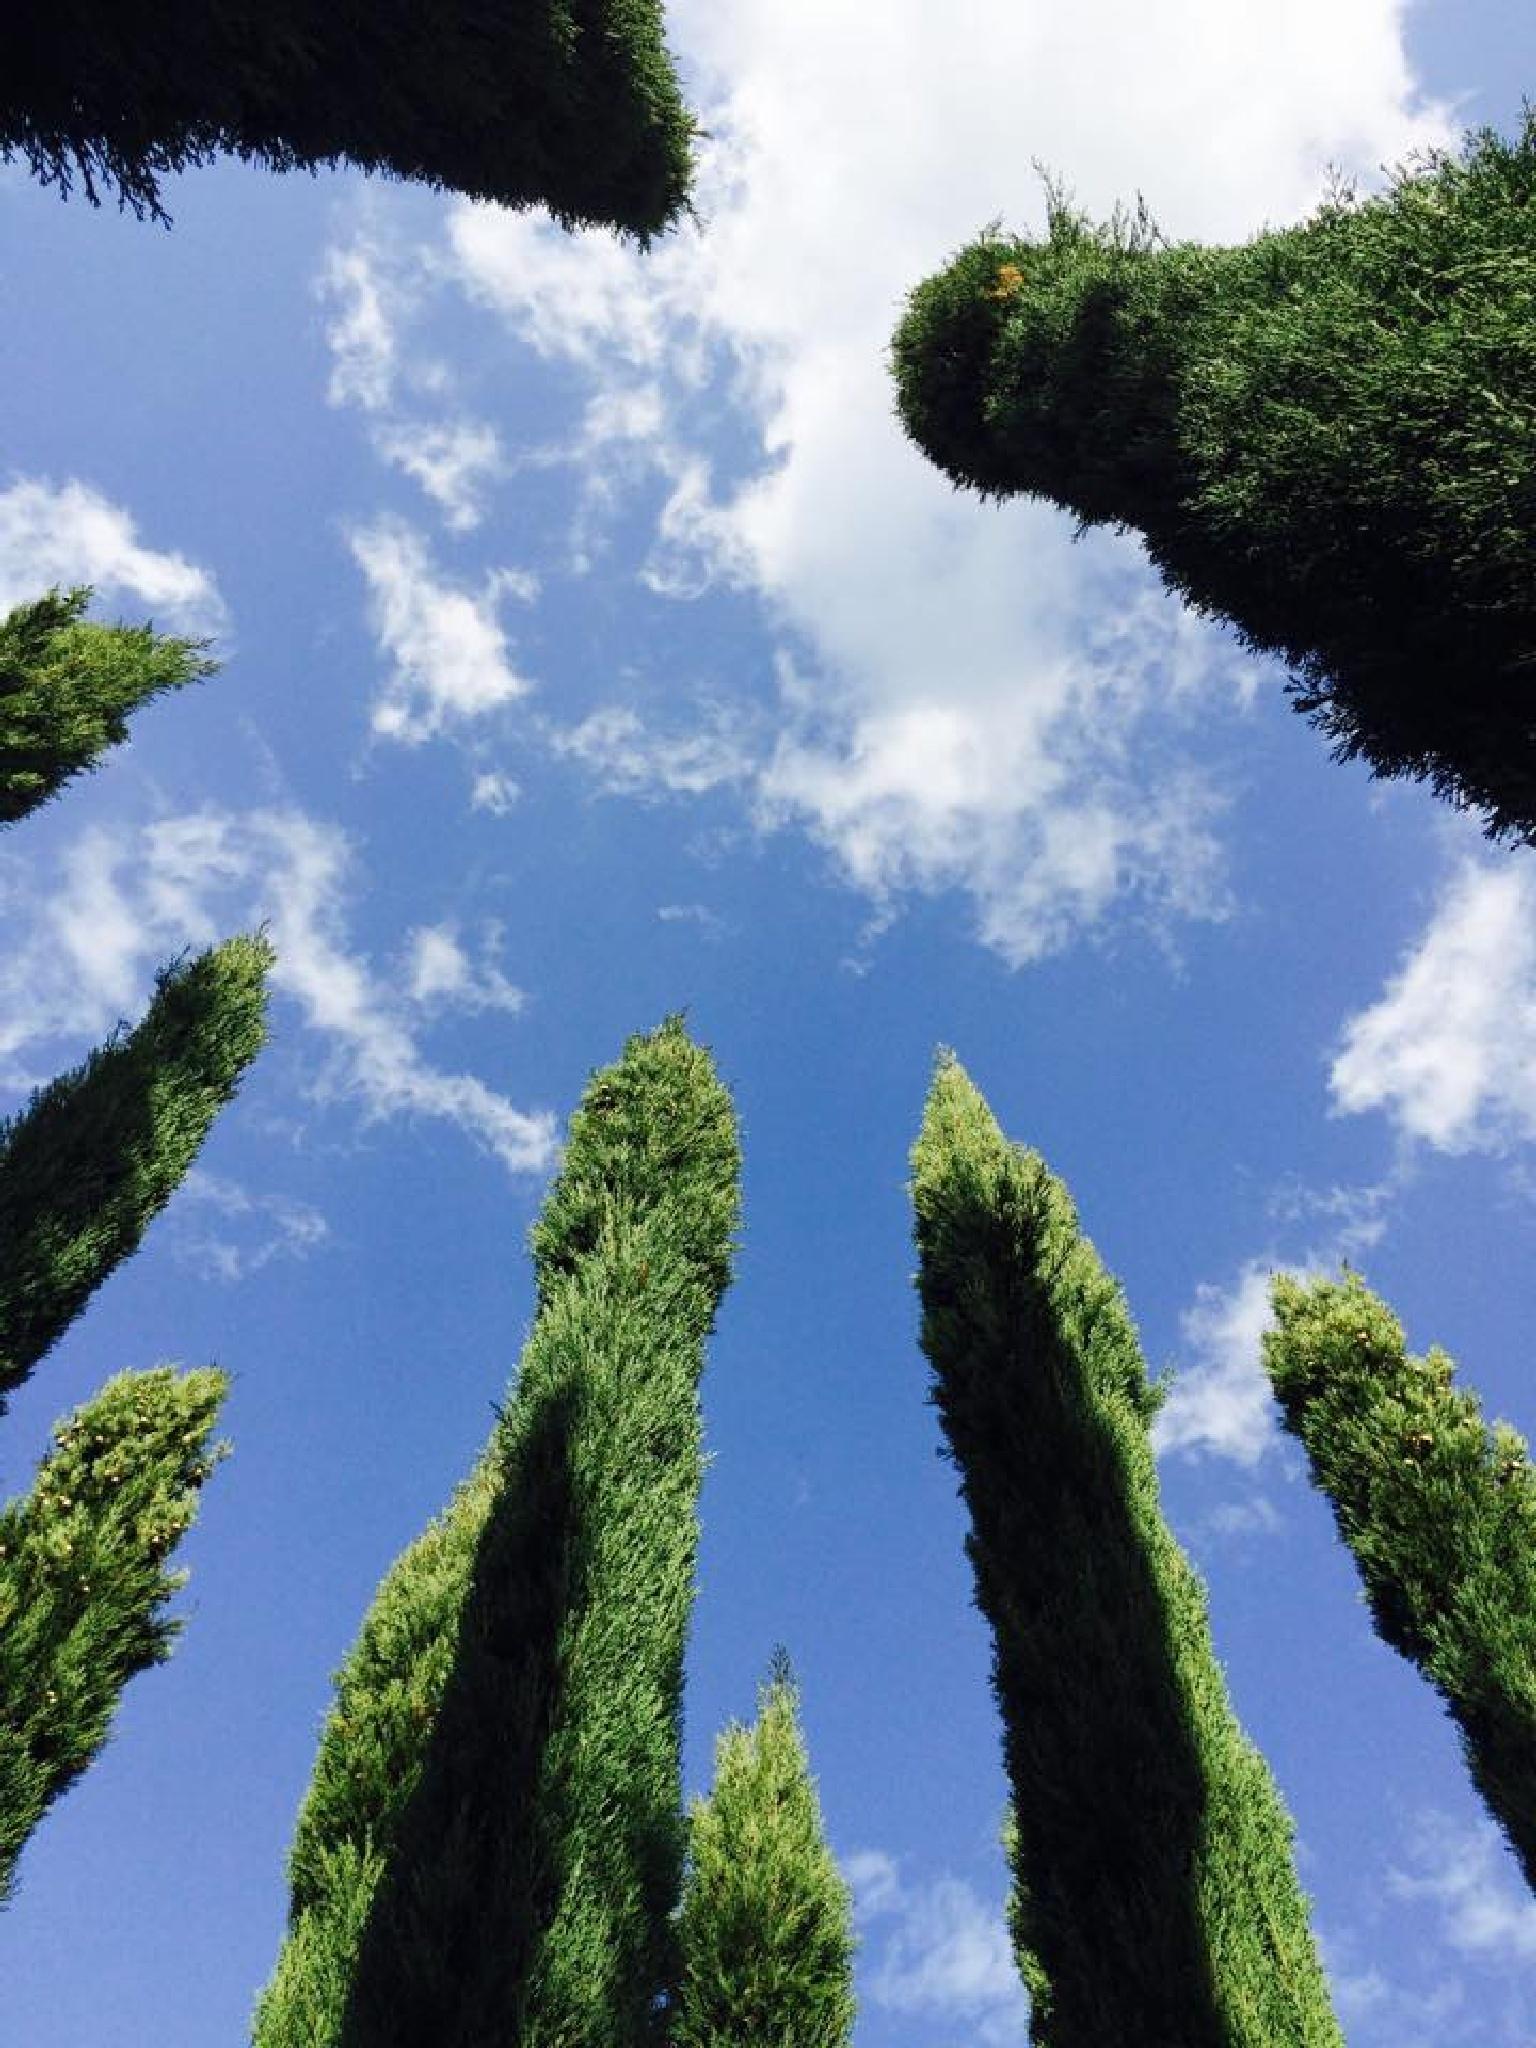 uzbas arboretum by Tarkan Oktay